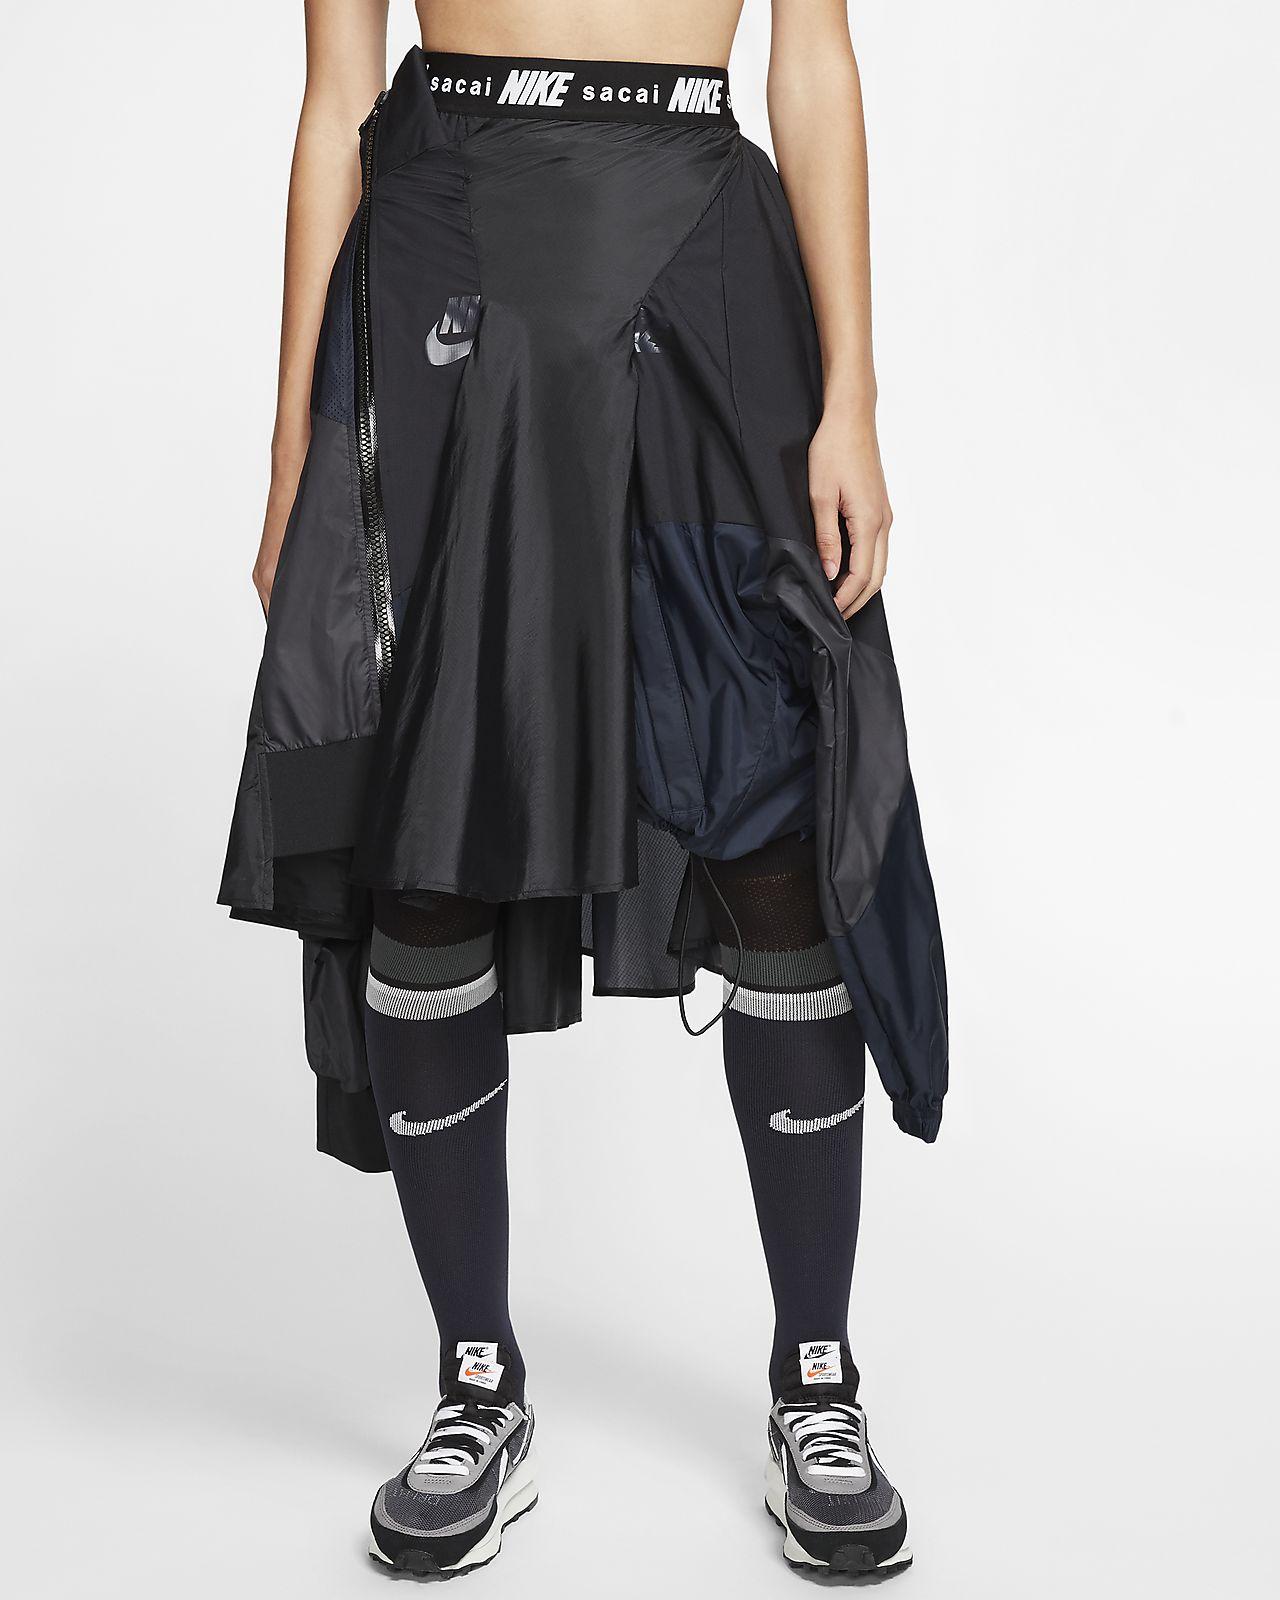 Jupe Nike x Sacai pour Femme